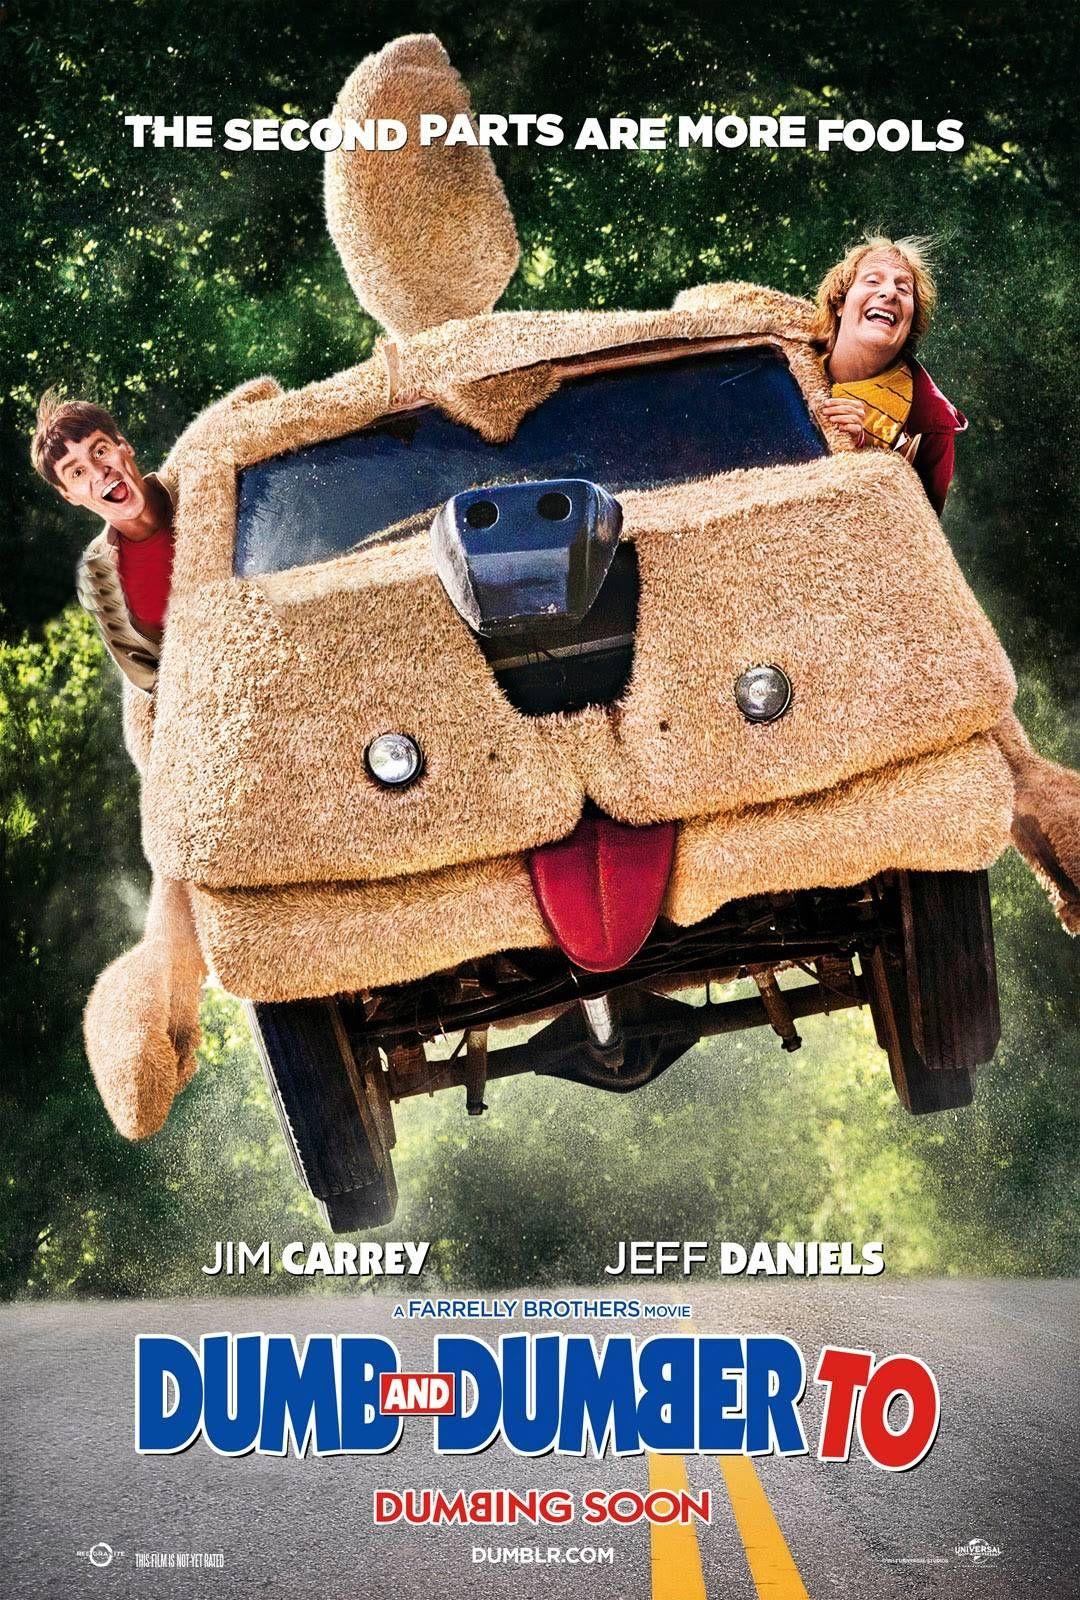 Dumb Et Dumber 1 Streaming Vf : dumber, streaming, Poster, Chính, Thức, Của, Phim., Dumber,, Funny, Movies,, Movies, Online